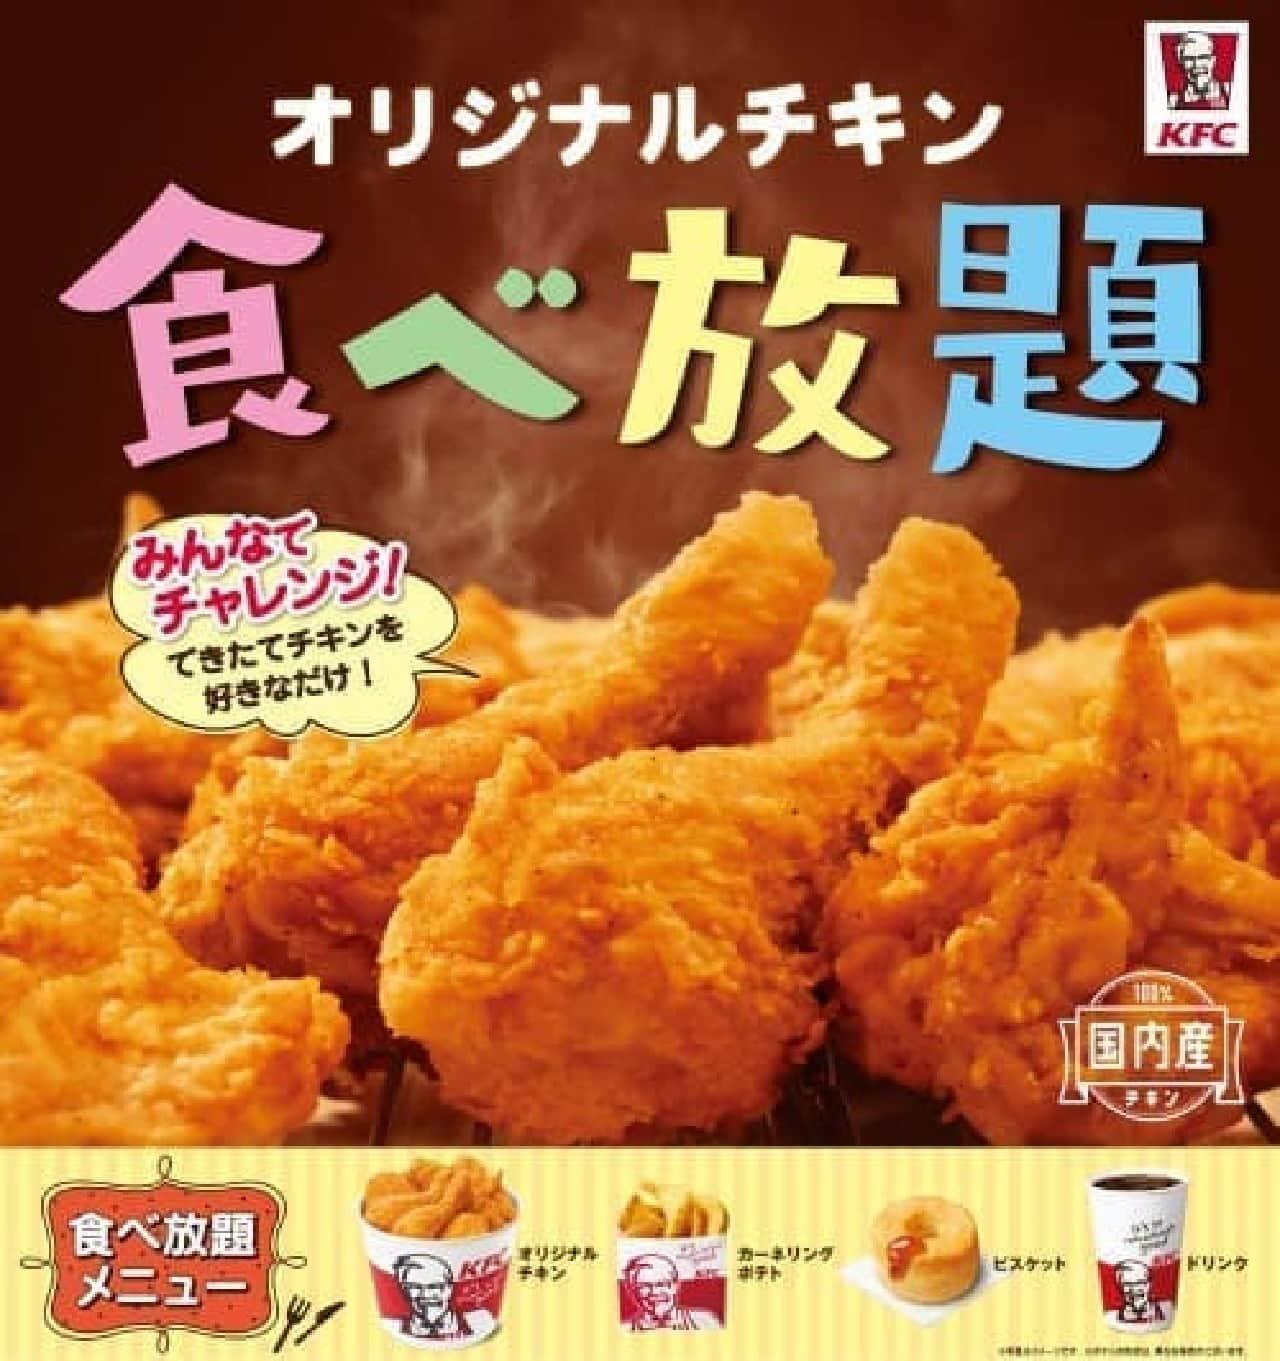 KFC「『オリジナルチキン』食べ放題!」